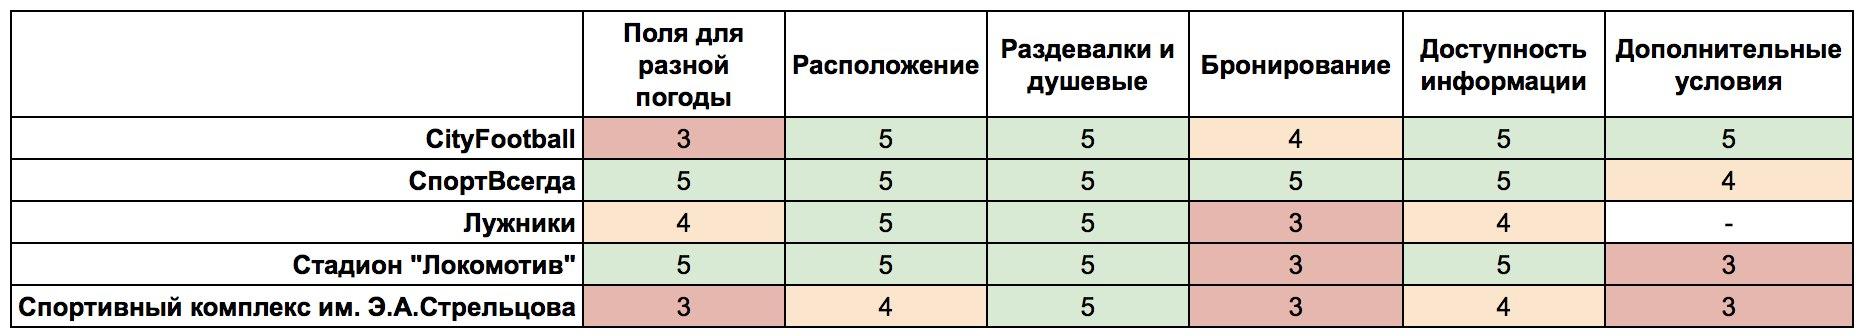 Таблица площадок Москвы